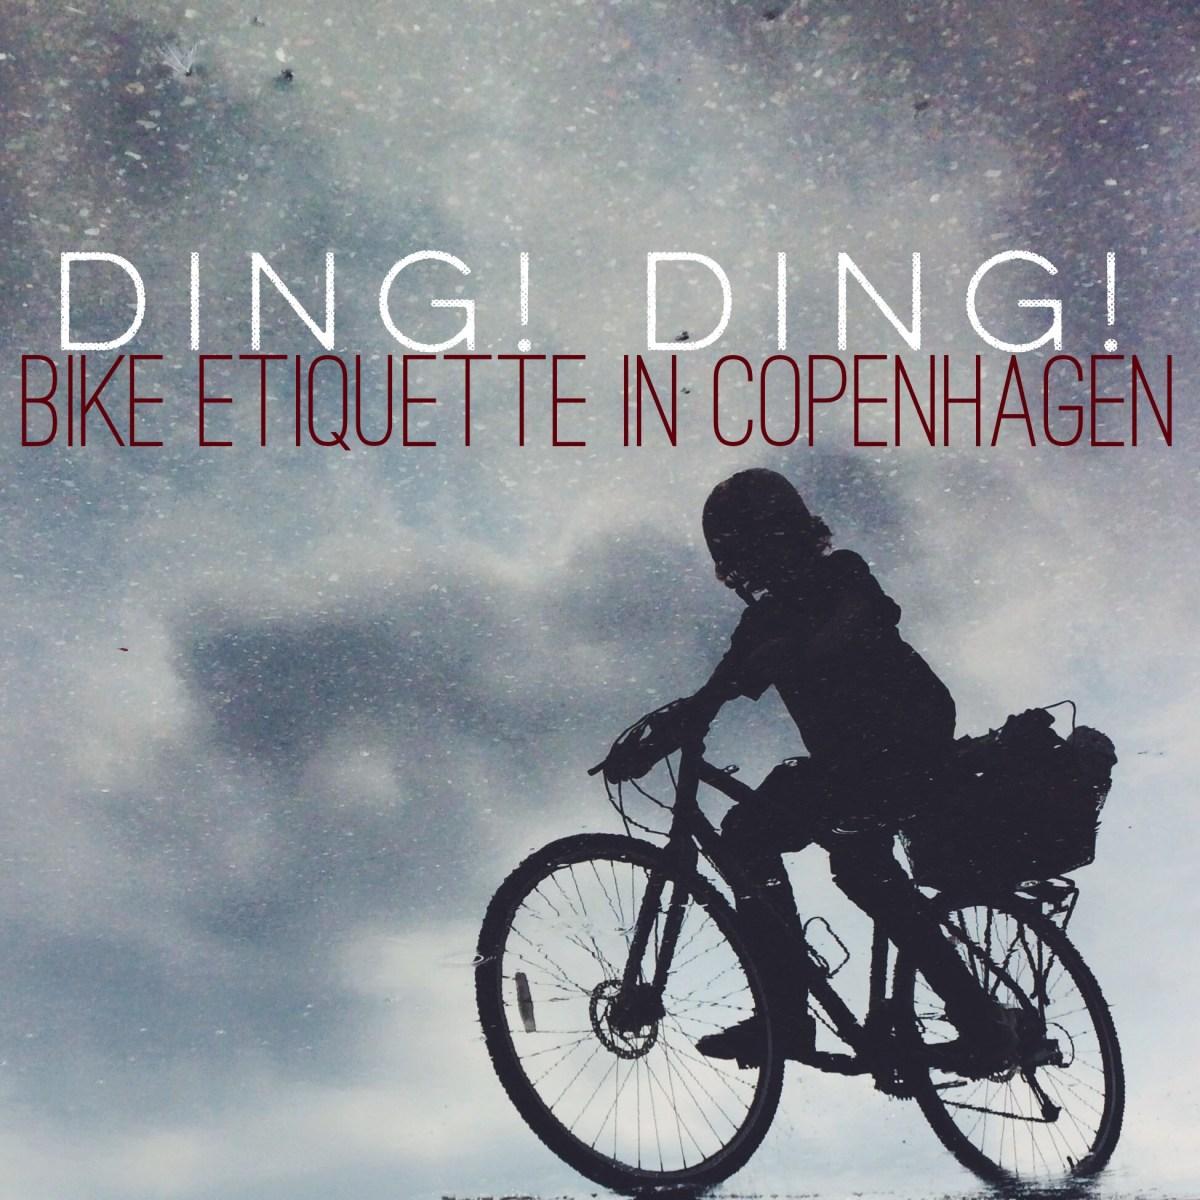 DING! DING! Biking Etiquette in Copenhagen